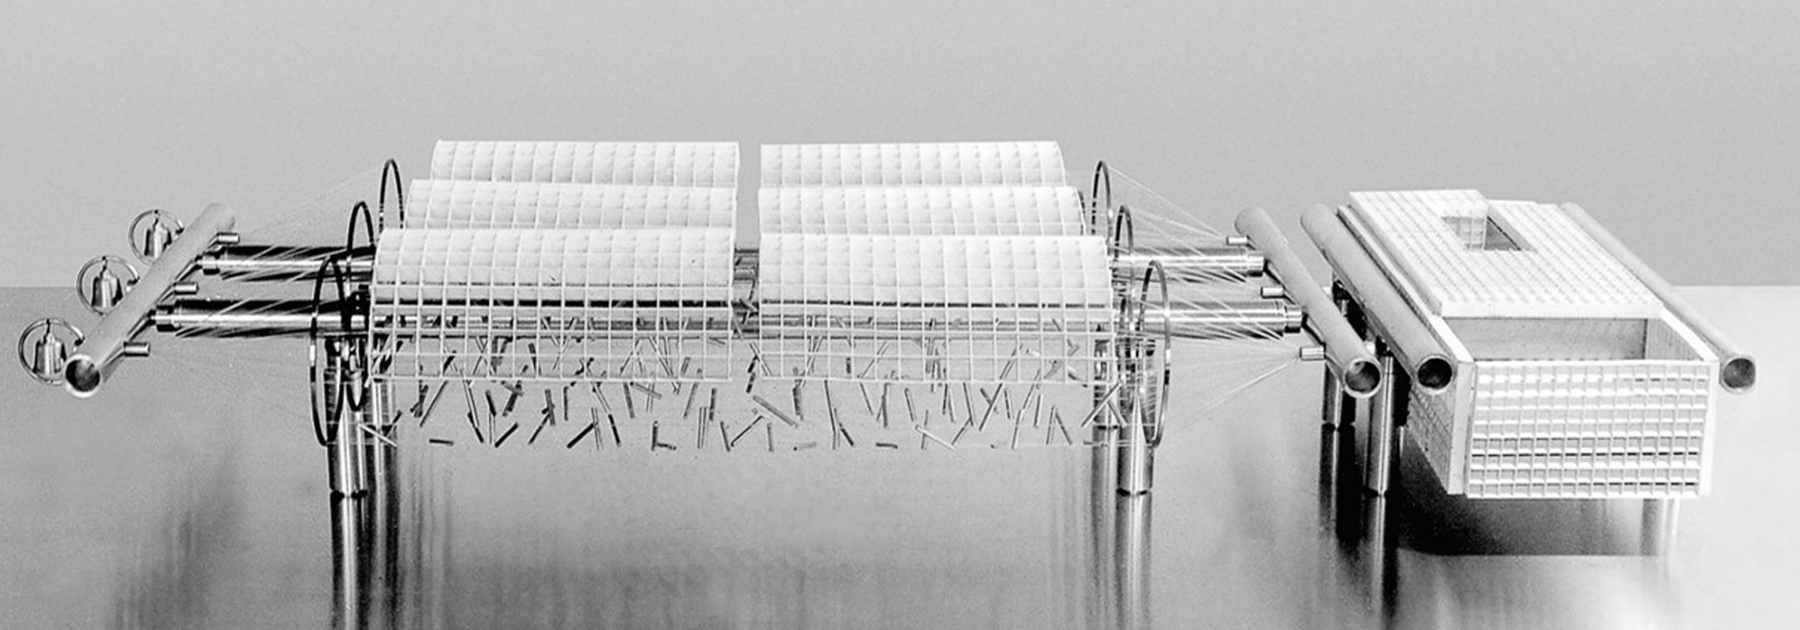 architecture-cover-desktop